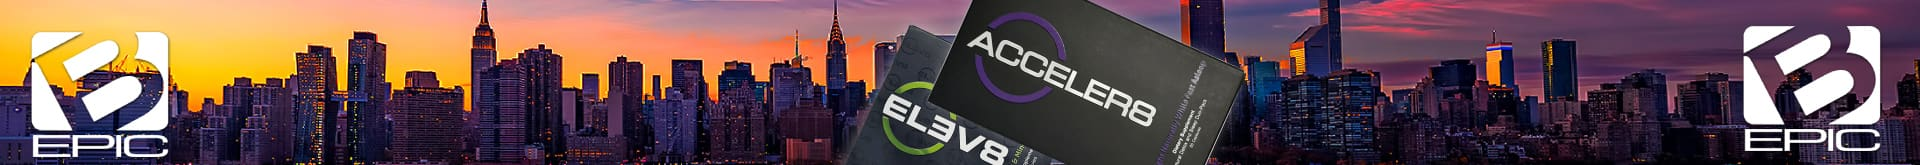 Elev8 & Acceler8 in NYC, NY, USA